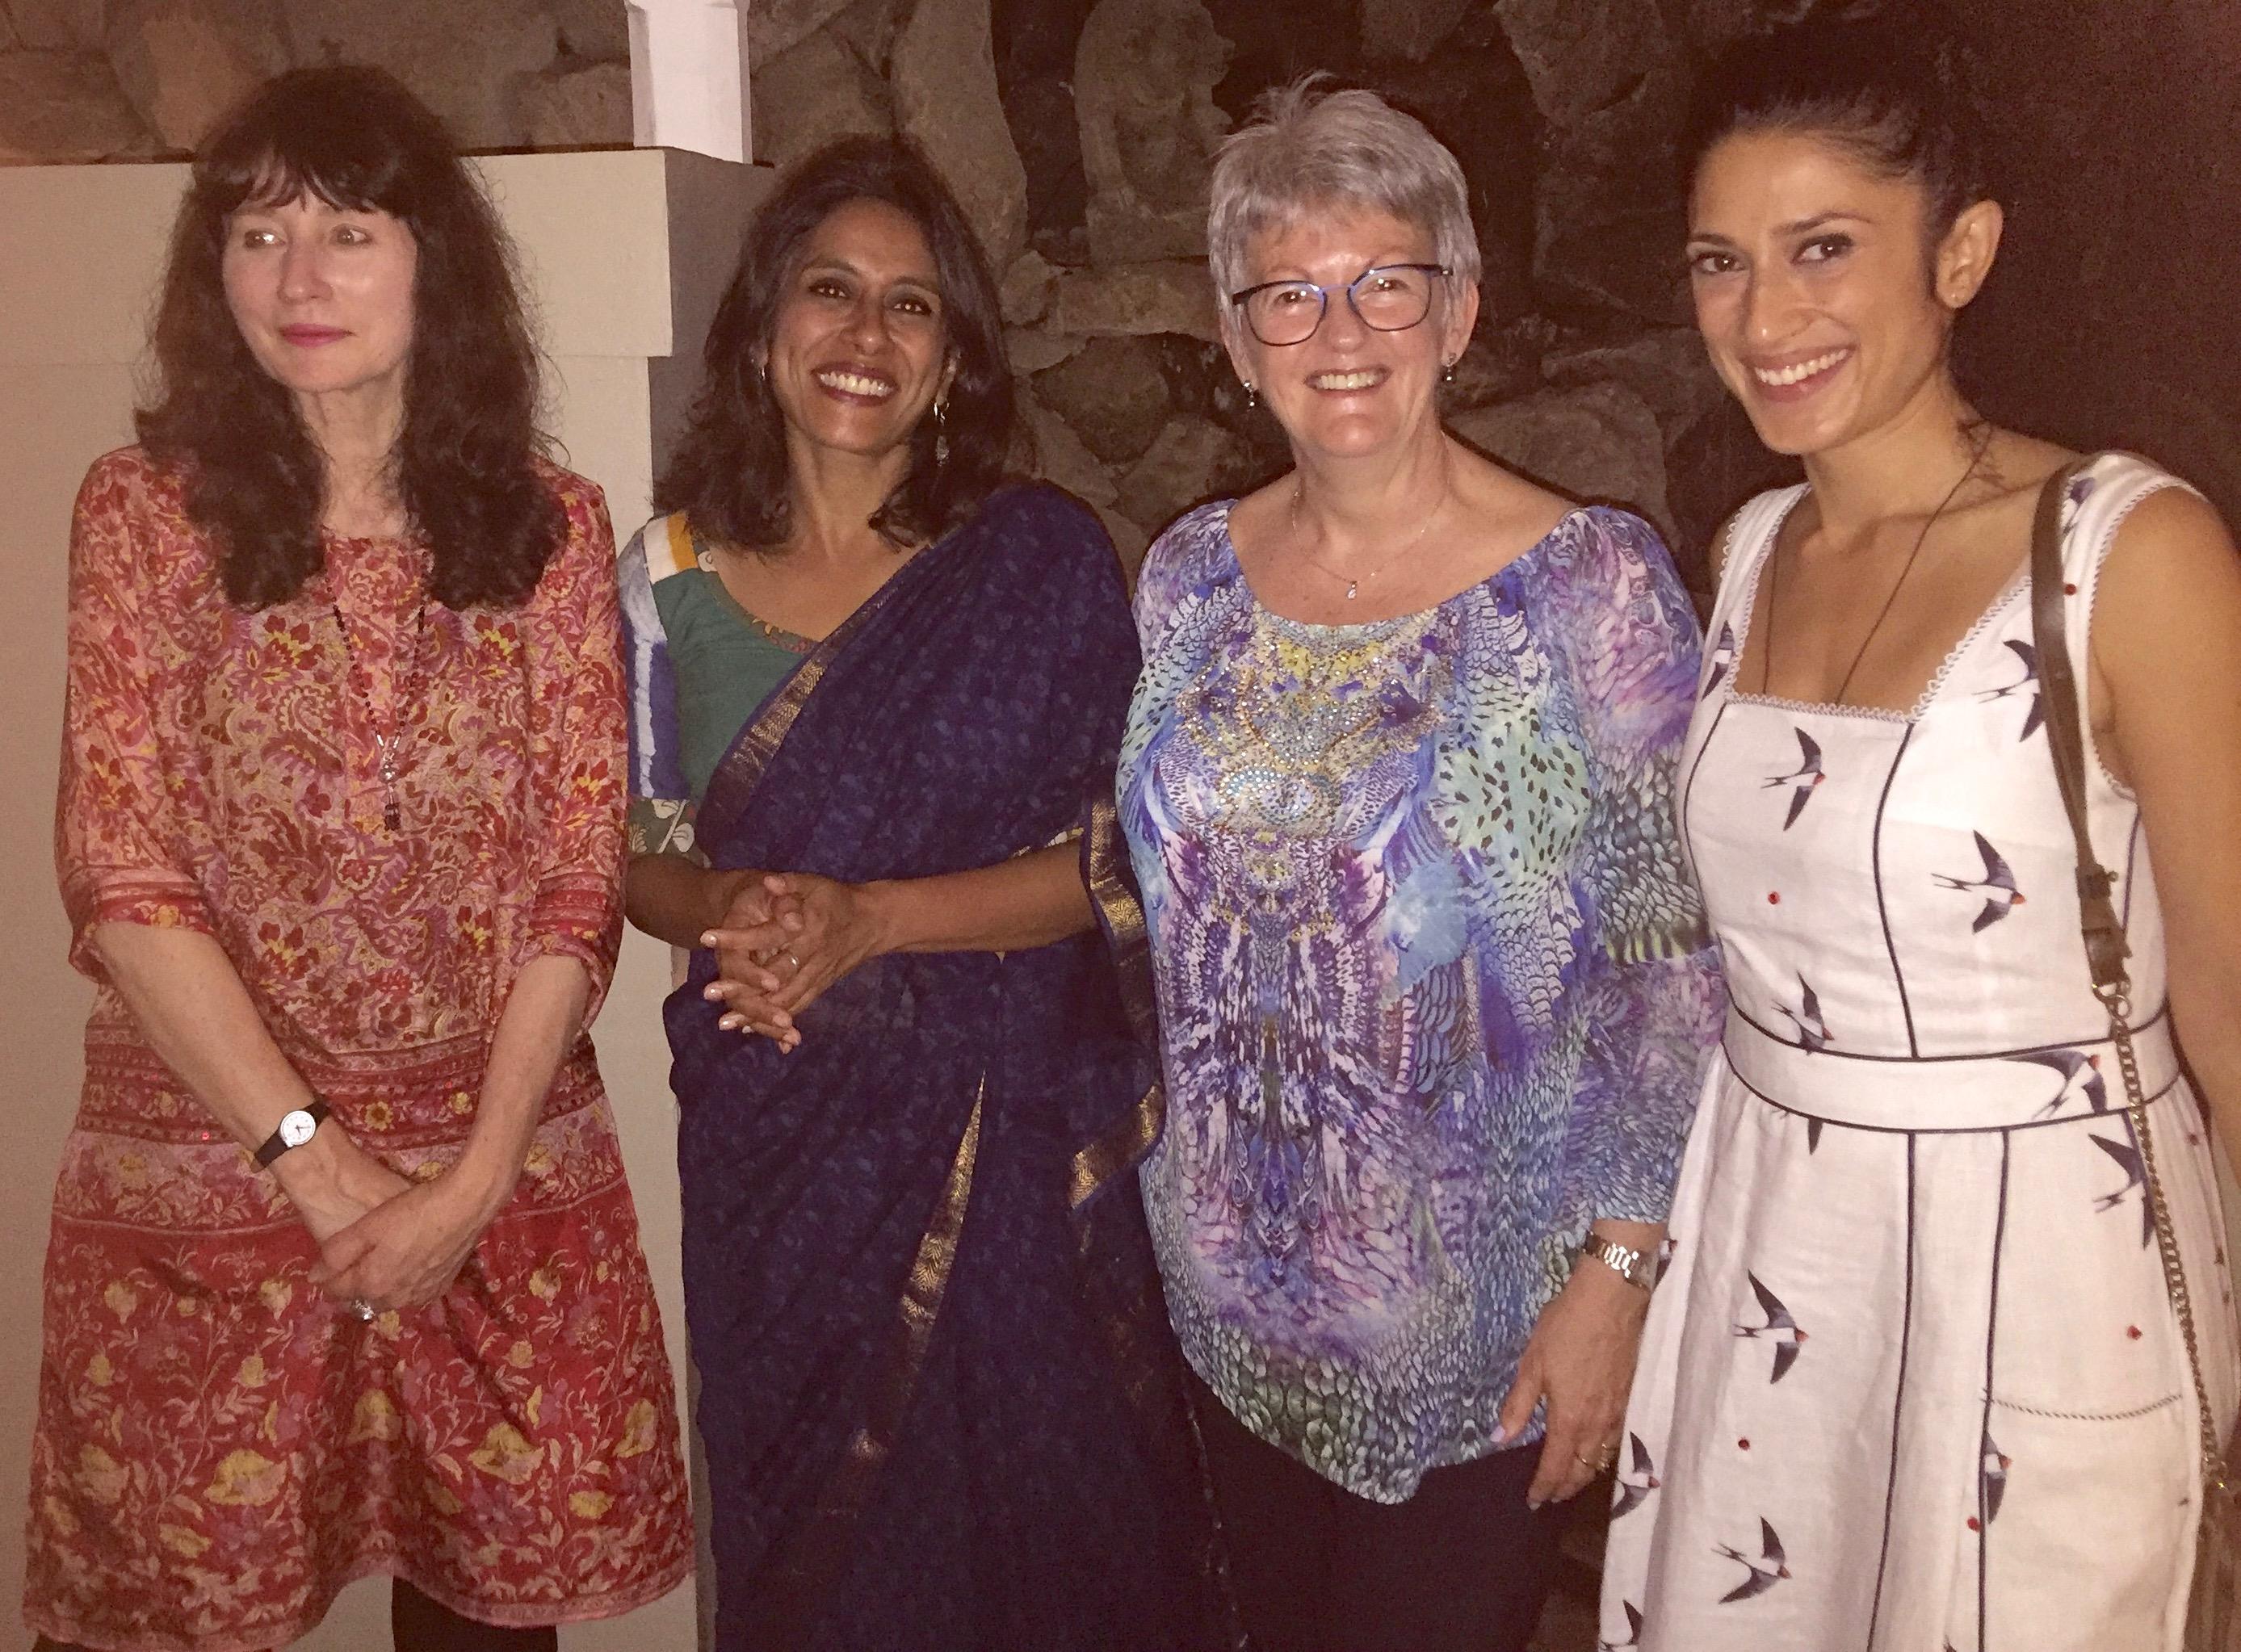 Ubud 2018 Gail Jones, Anurahda Roy, Rose, Fatima Bhutto